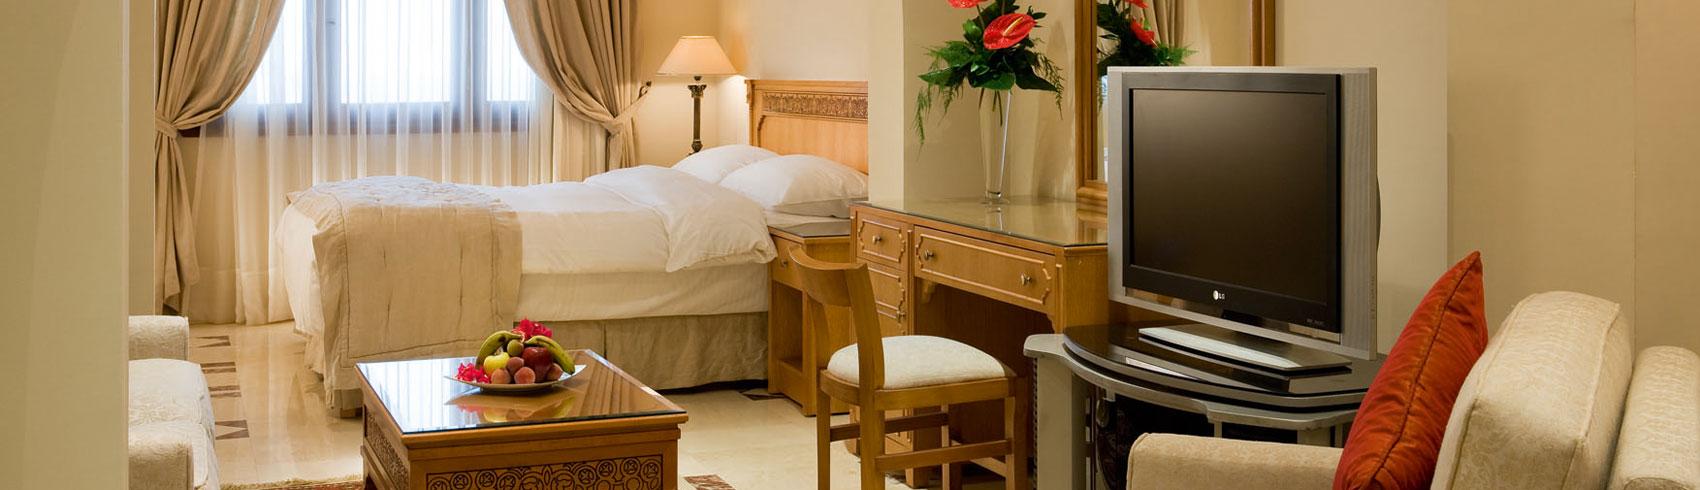 Moevenpick Resort Sharm El Sheikh image17